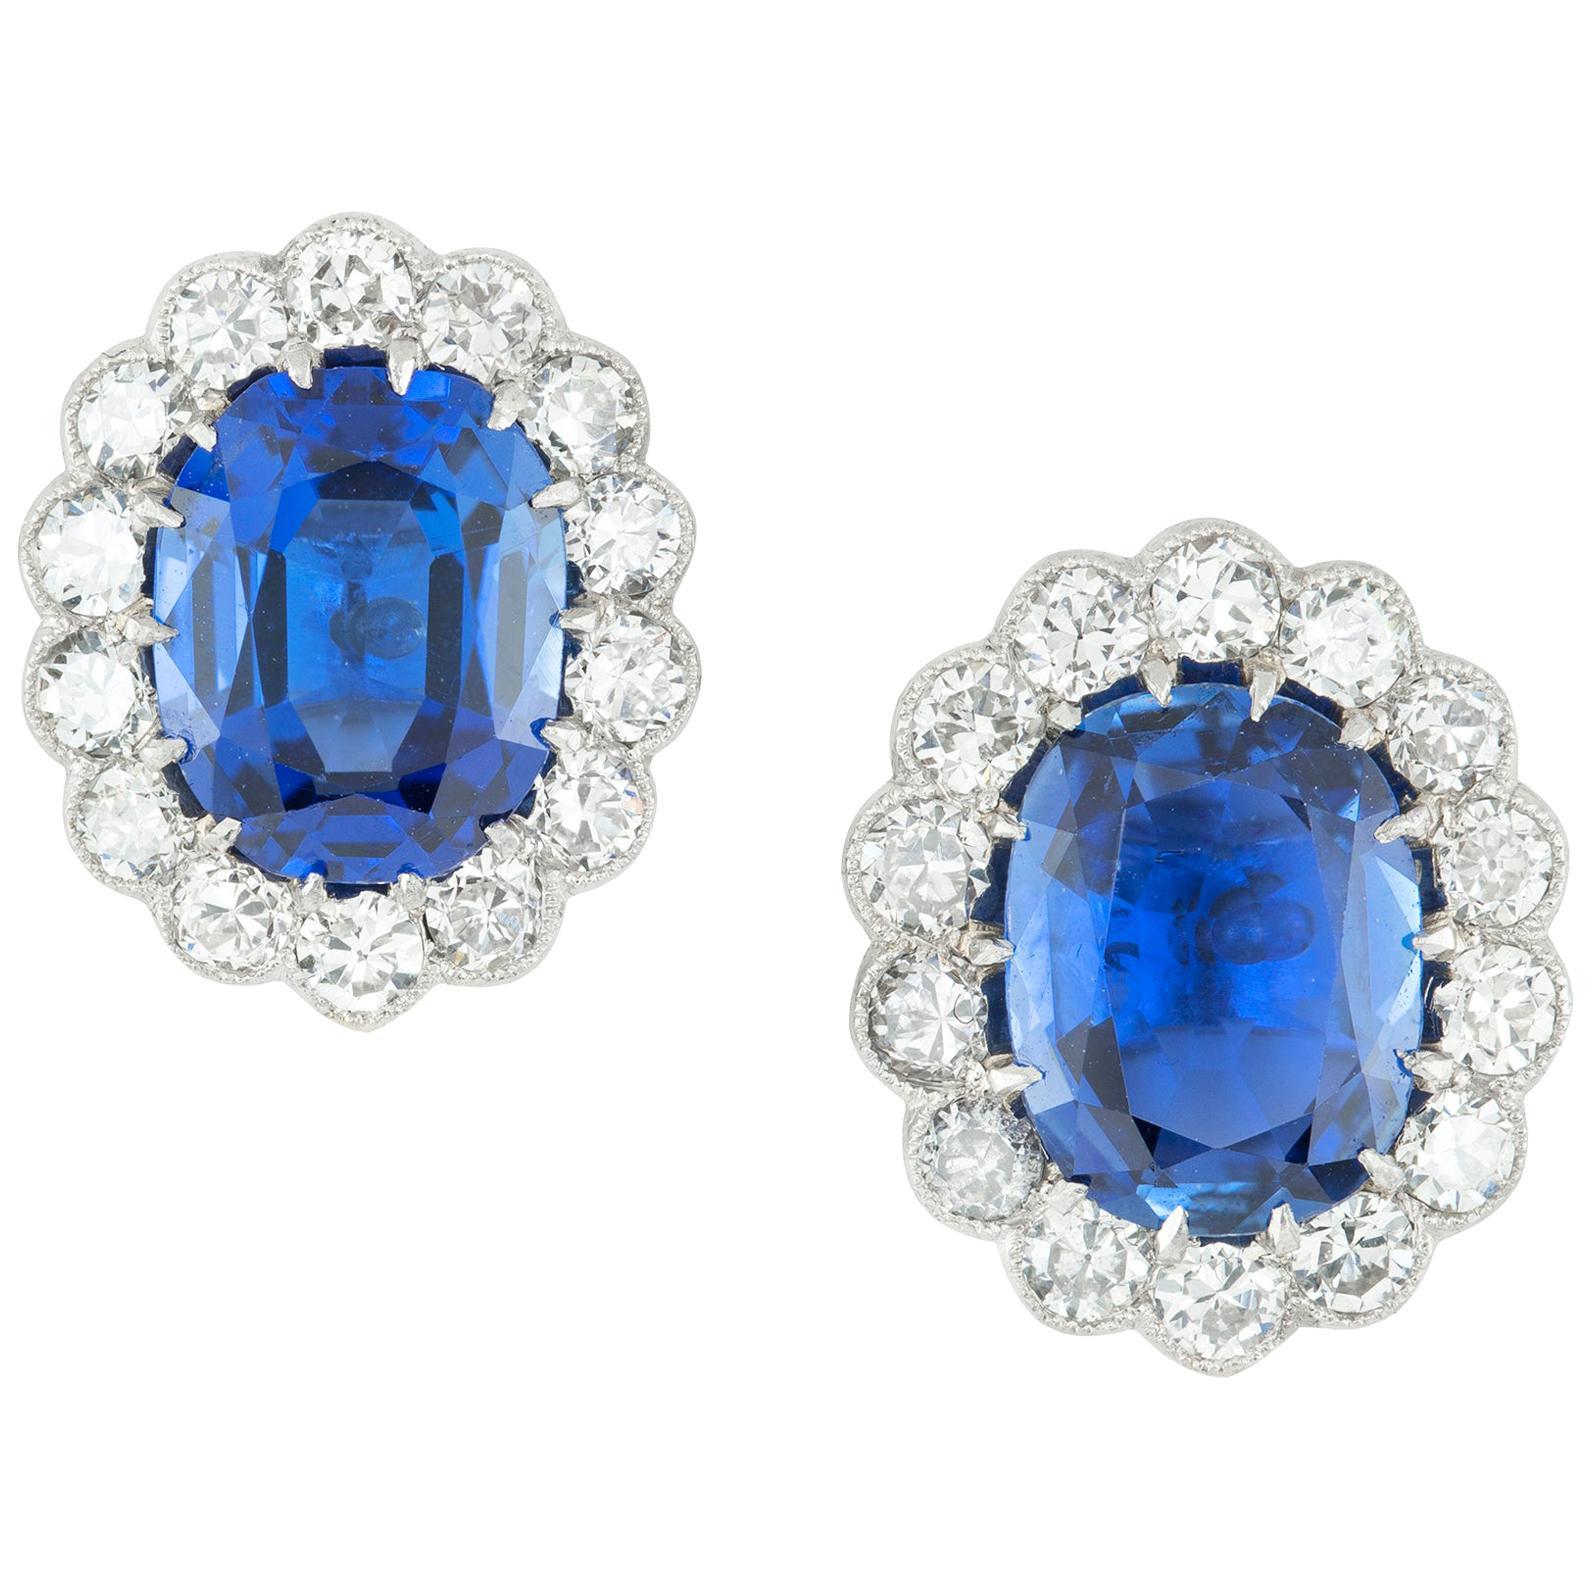 George V Earrings